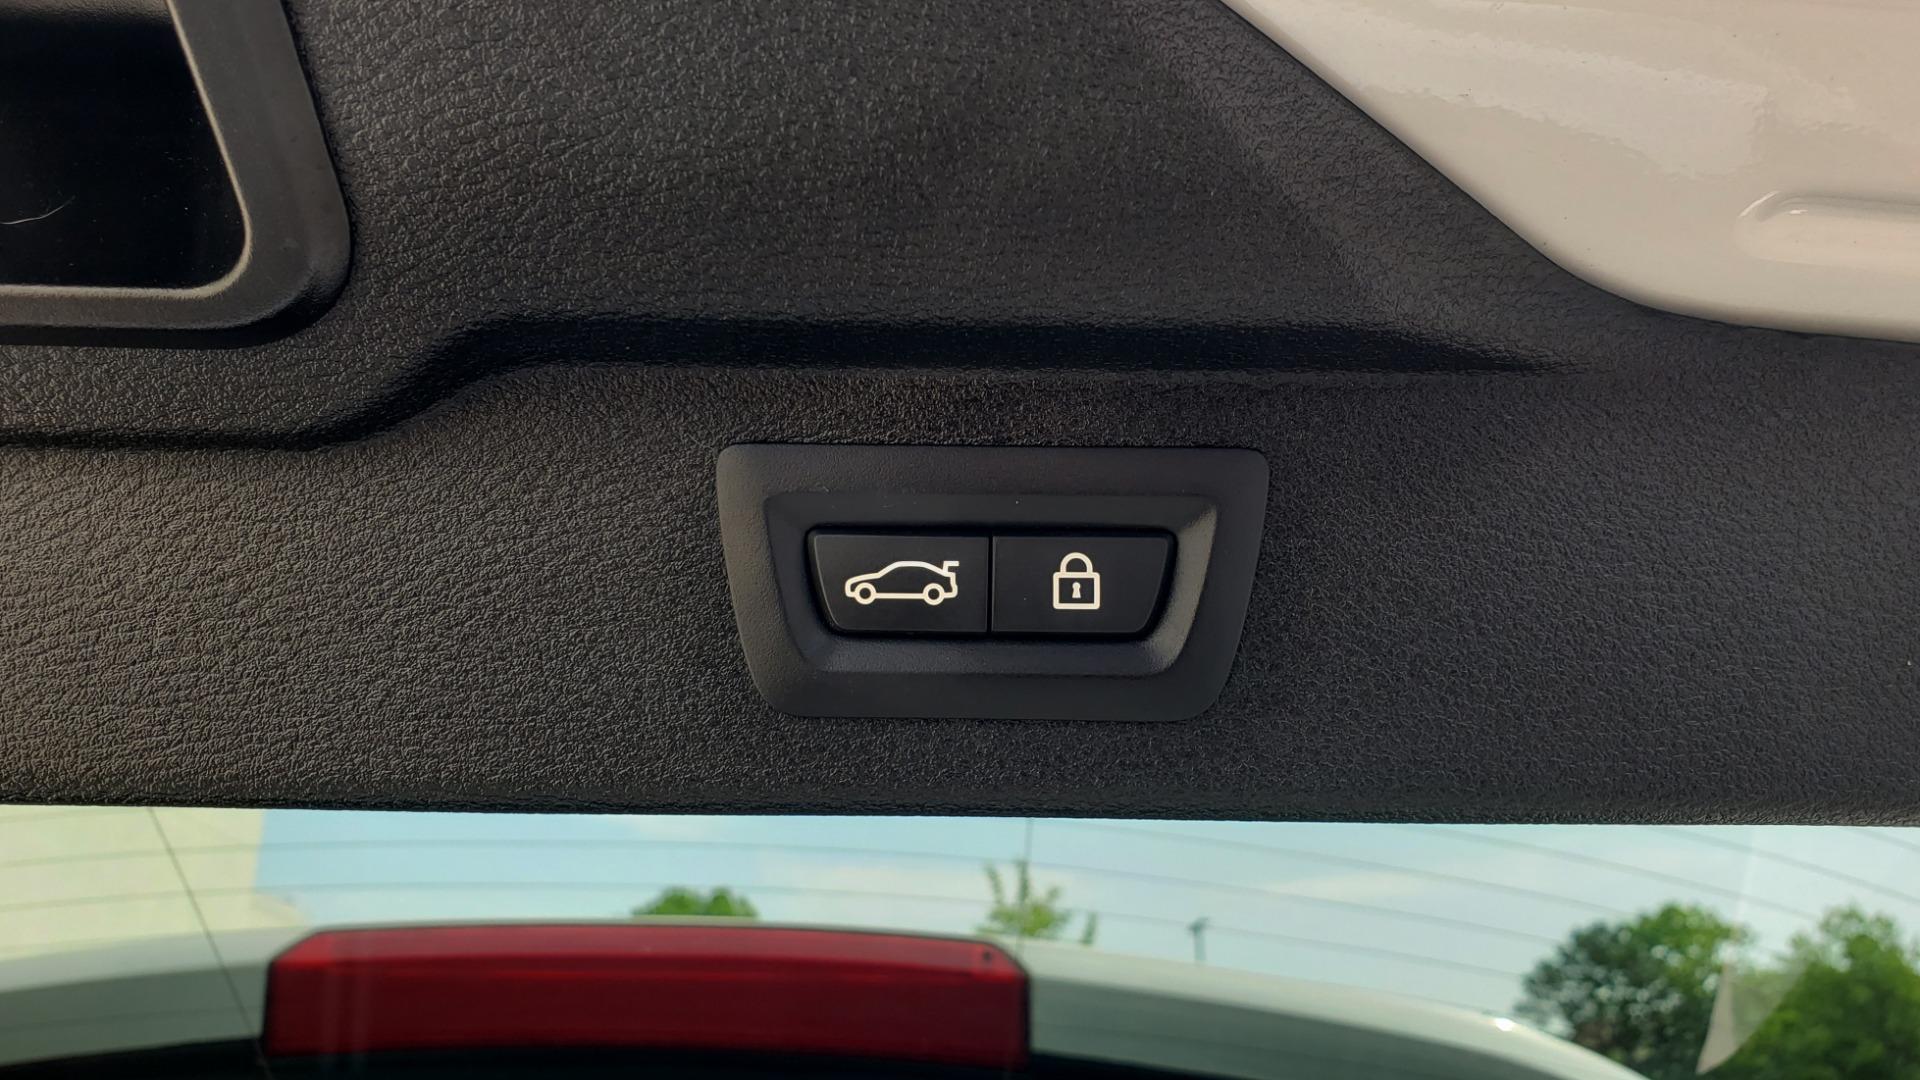 Used 2017 BMW X5 M EXECUTIVE PKG / NAV / DRVR ASST / BSM / HUD / HTD STS / WIFI for sale Sold at Formula Imports in Charlotte NC 28227 21